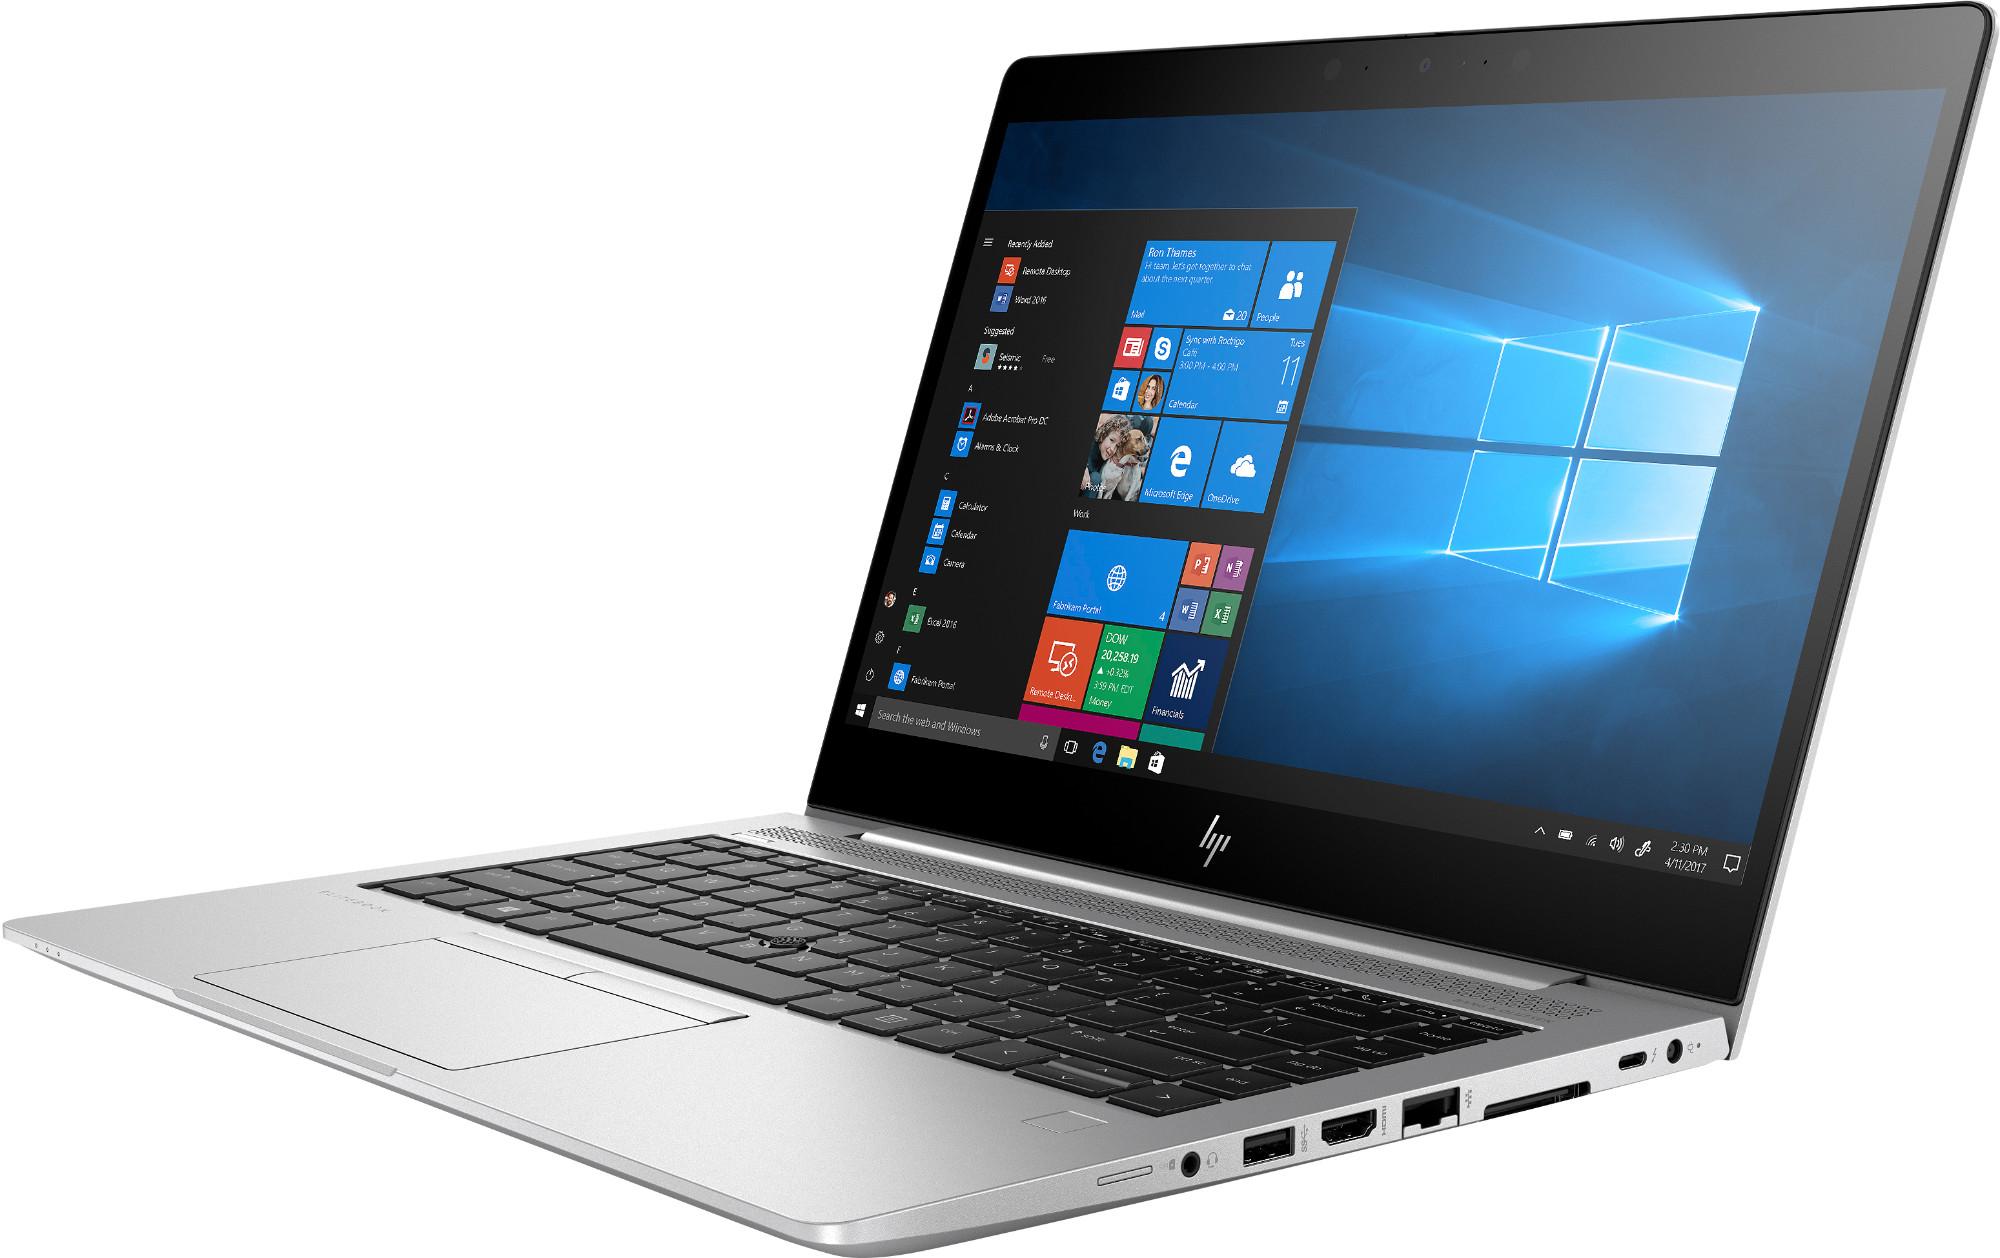 HP EliteBook 840 G6 Silber Notebook front